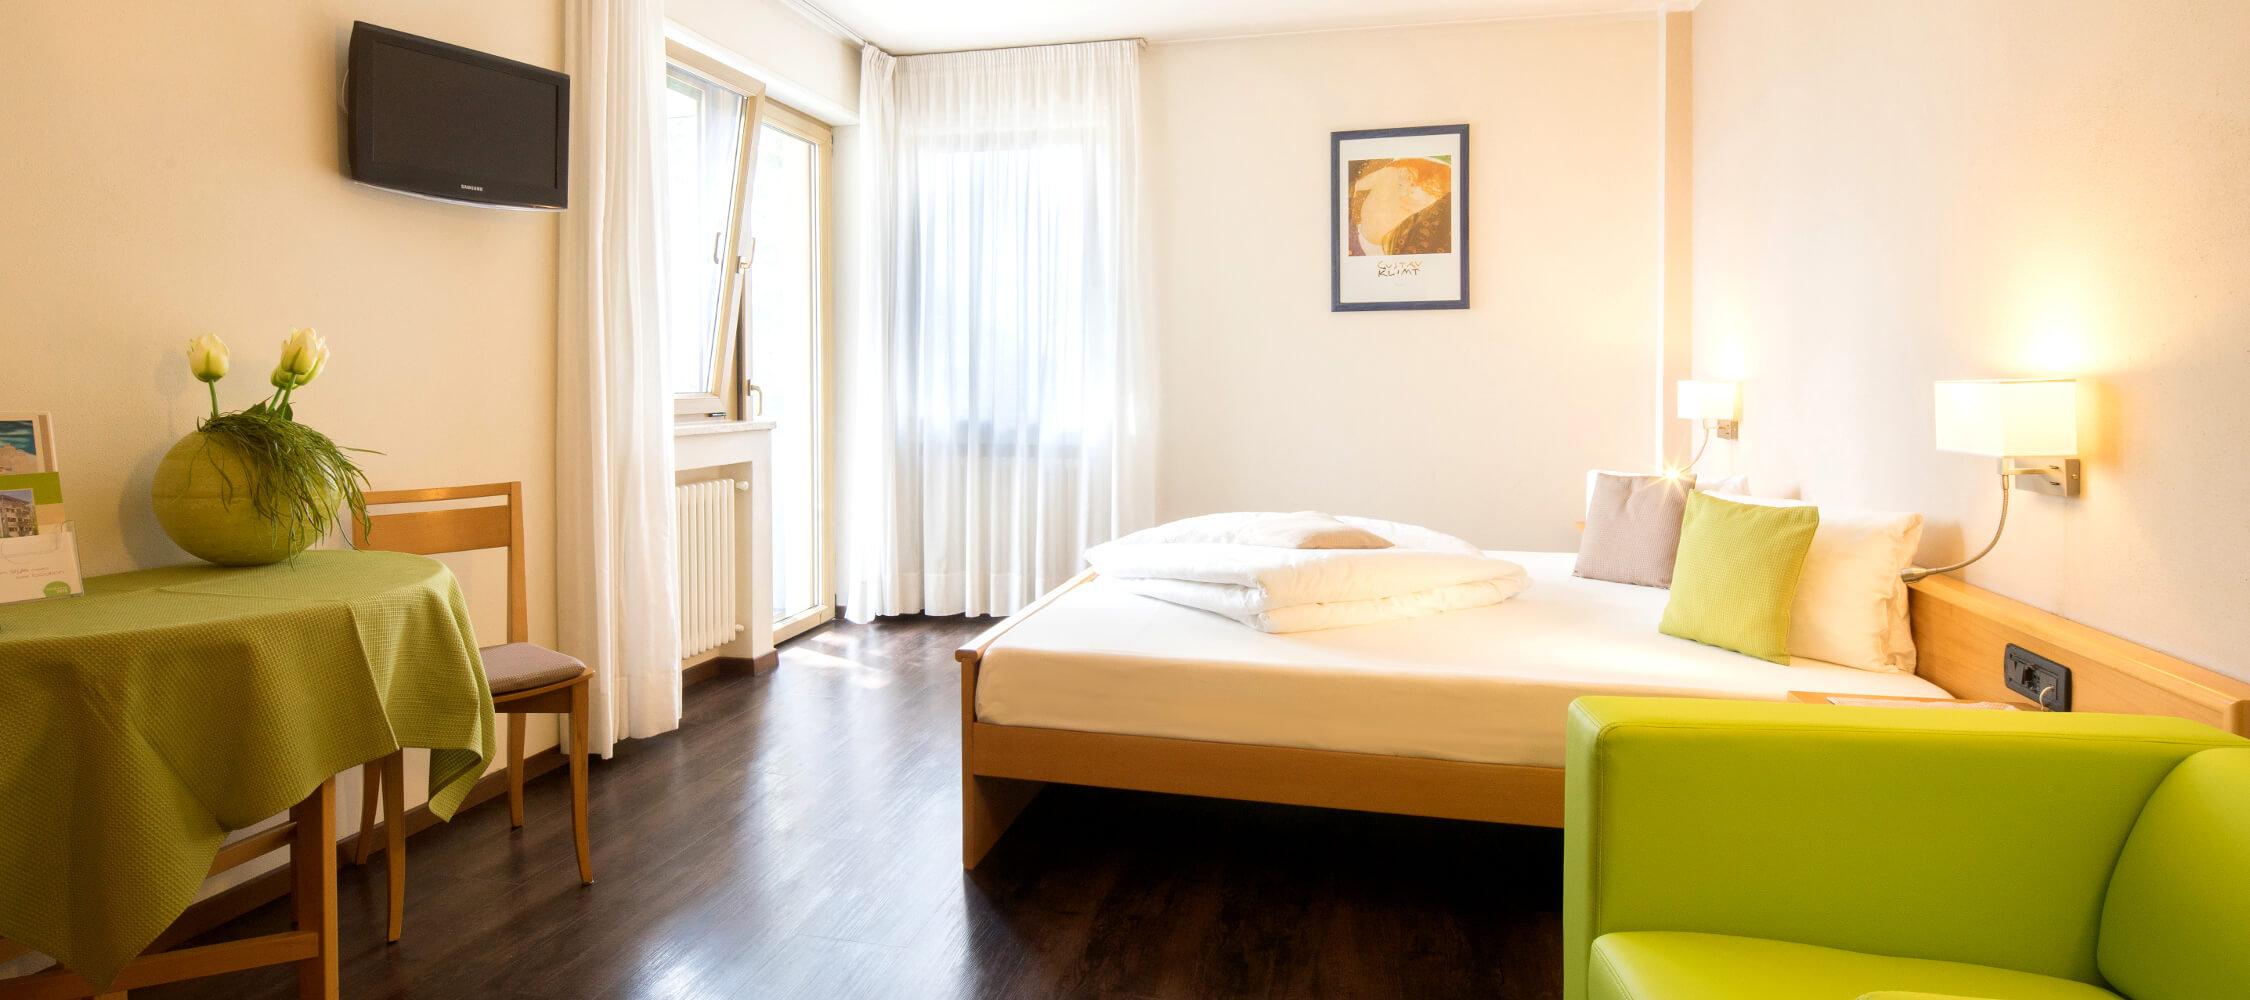 Hotel_Flora_Merano_Rooms_Doppelzimmer_Rose_Florian_Busch_02064_2250x1000